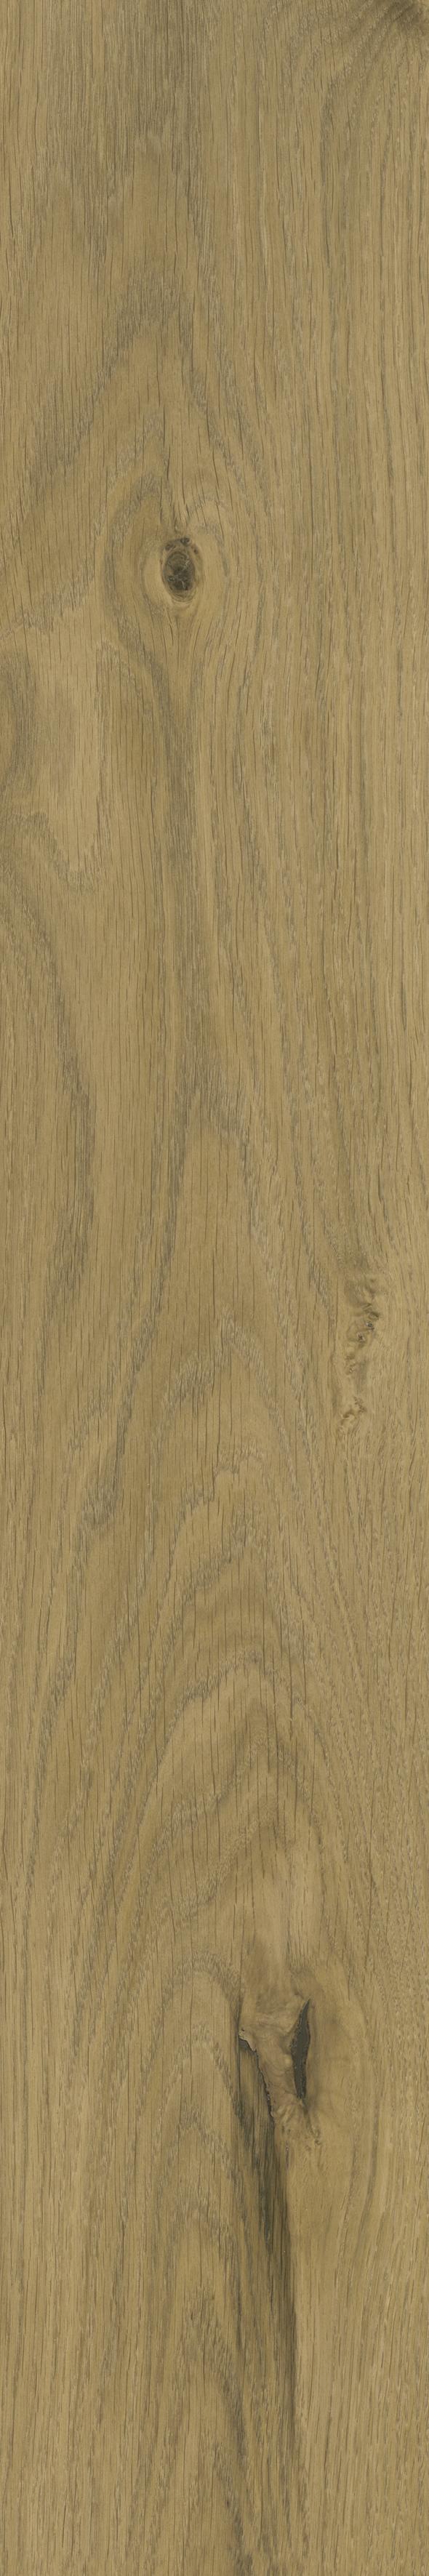 法国橡木 French oak